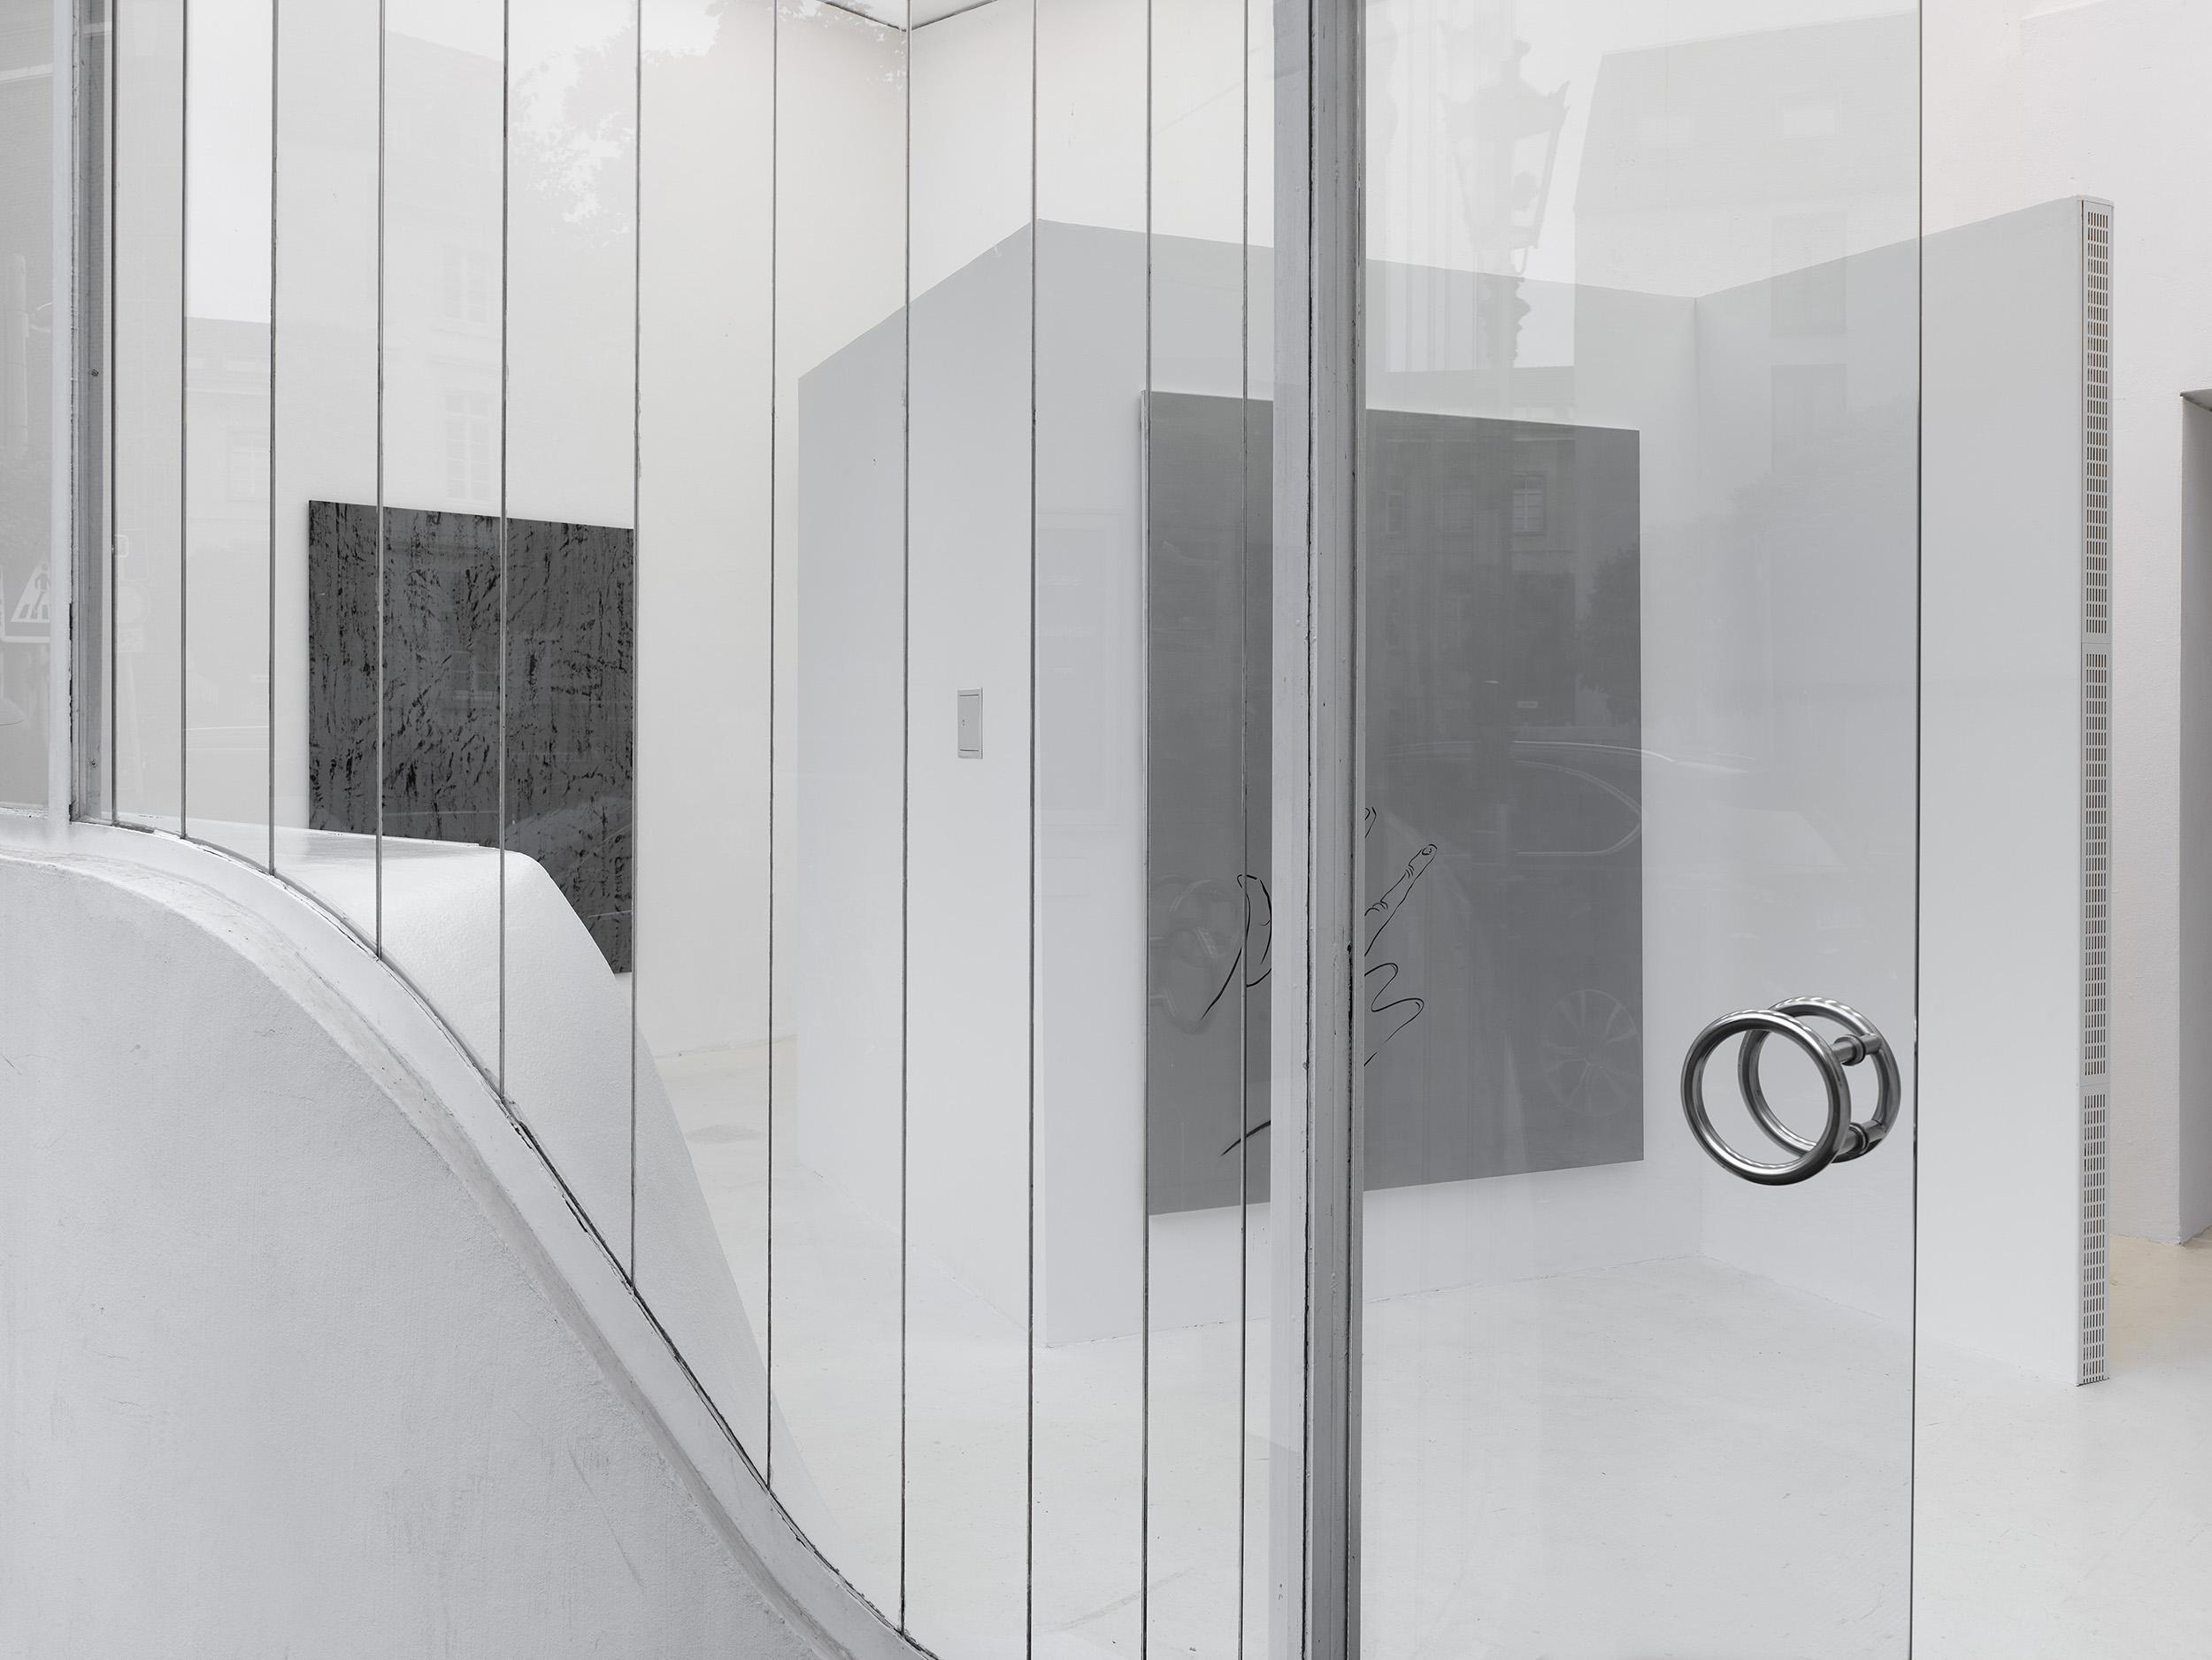 8 - Henning Strassburger at Sies  Höke Düsseldorf